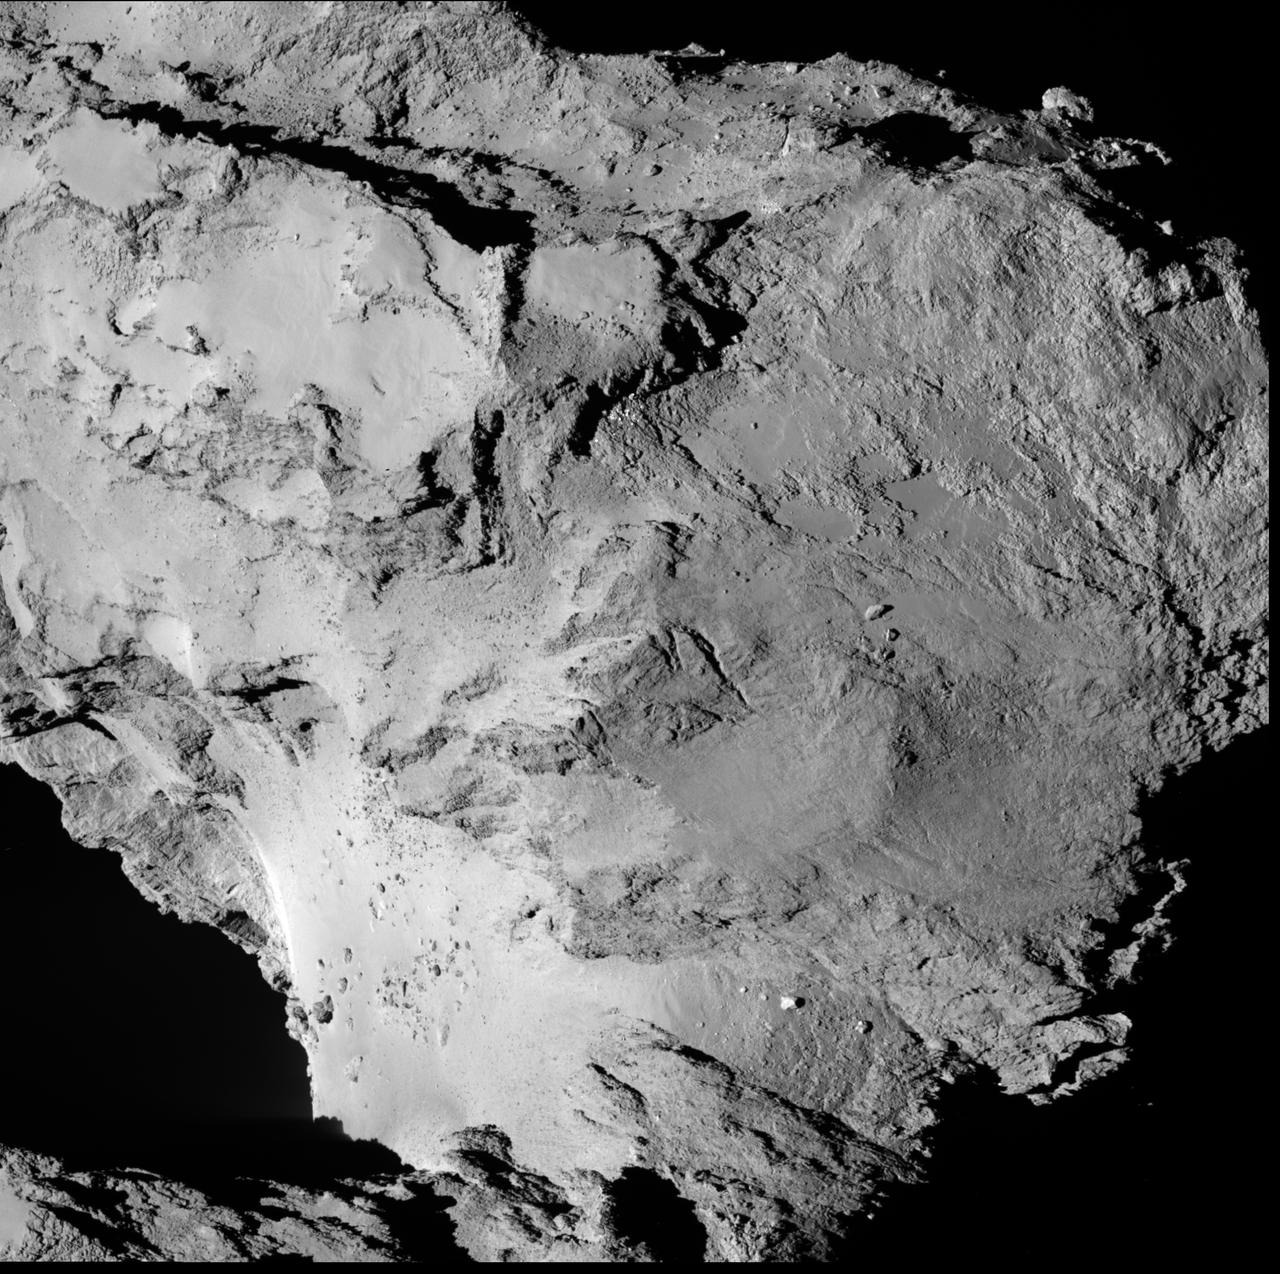 1567215806190-ESA_Rosetta_OSIRIS_Khepry-Aker_1280.jpg